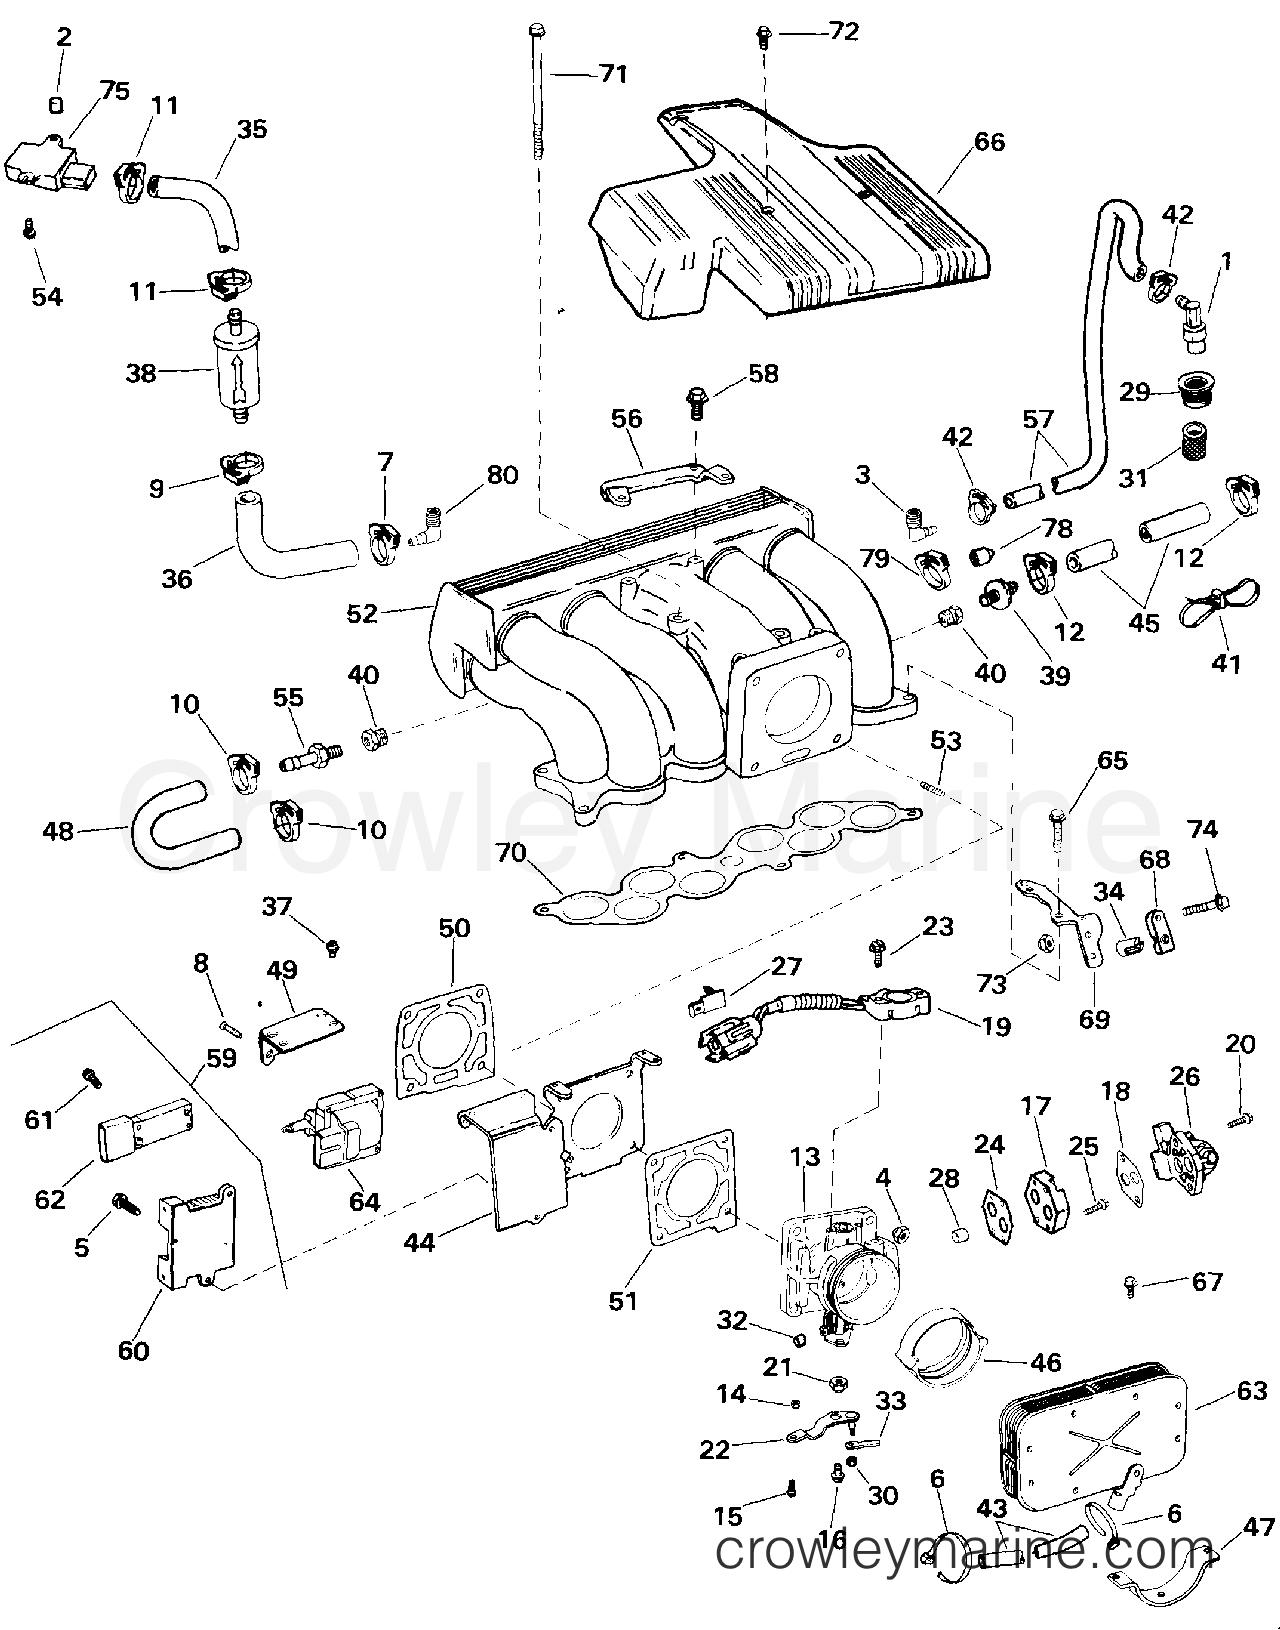 1994 OMC Stern Drive 5.8 - 58FAGPMDM - UPPER INTAKE MANIFOLD - 5.0 LITRE MODELS